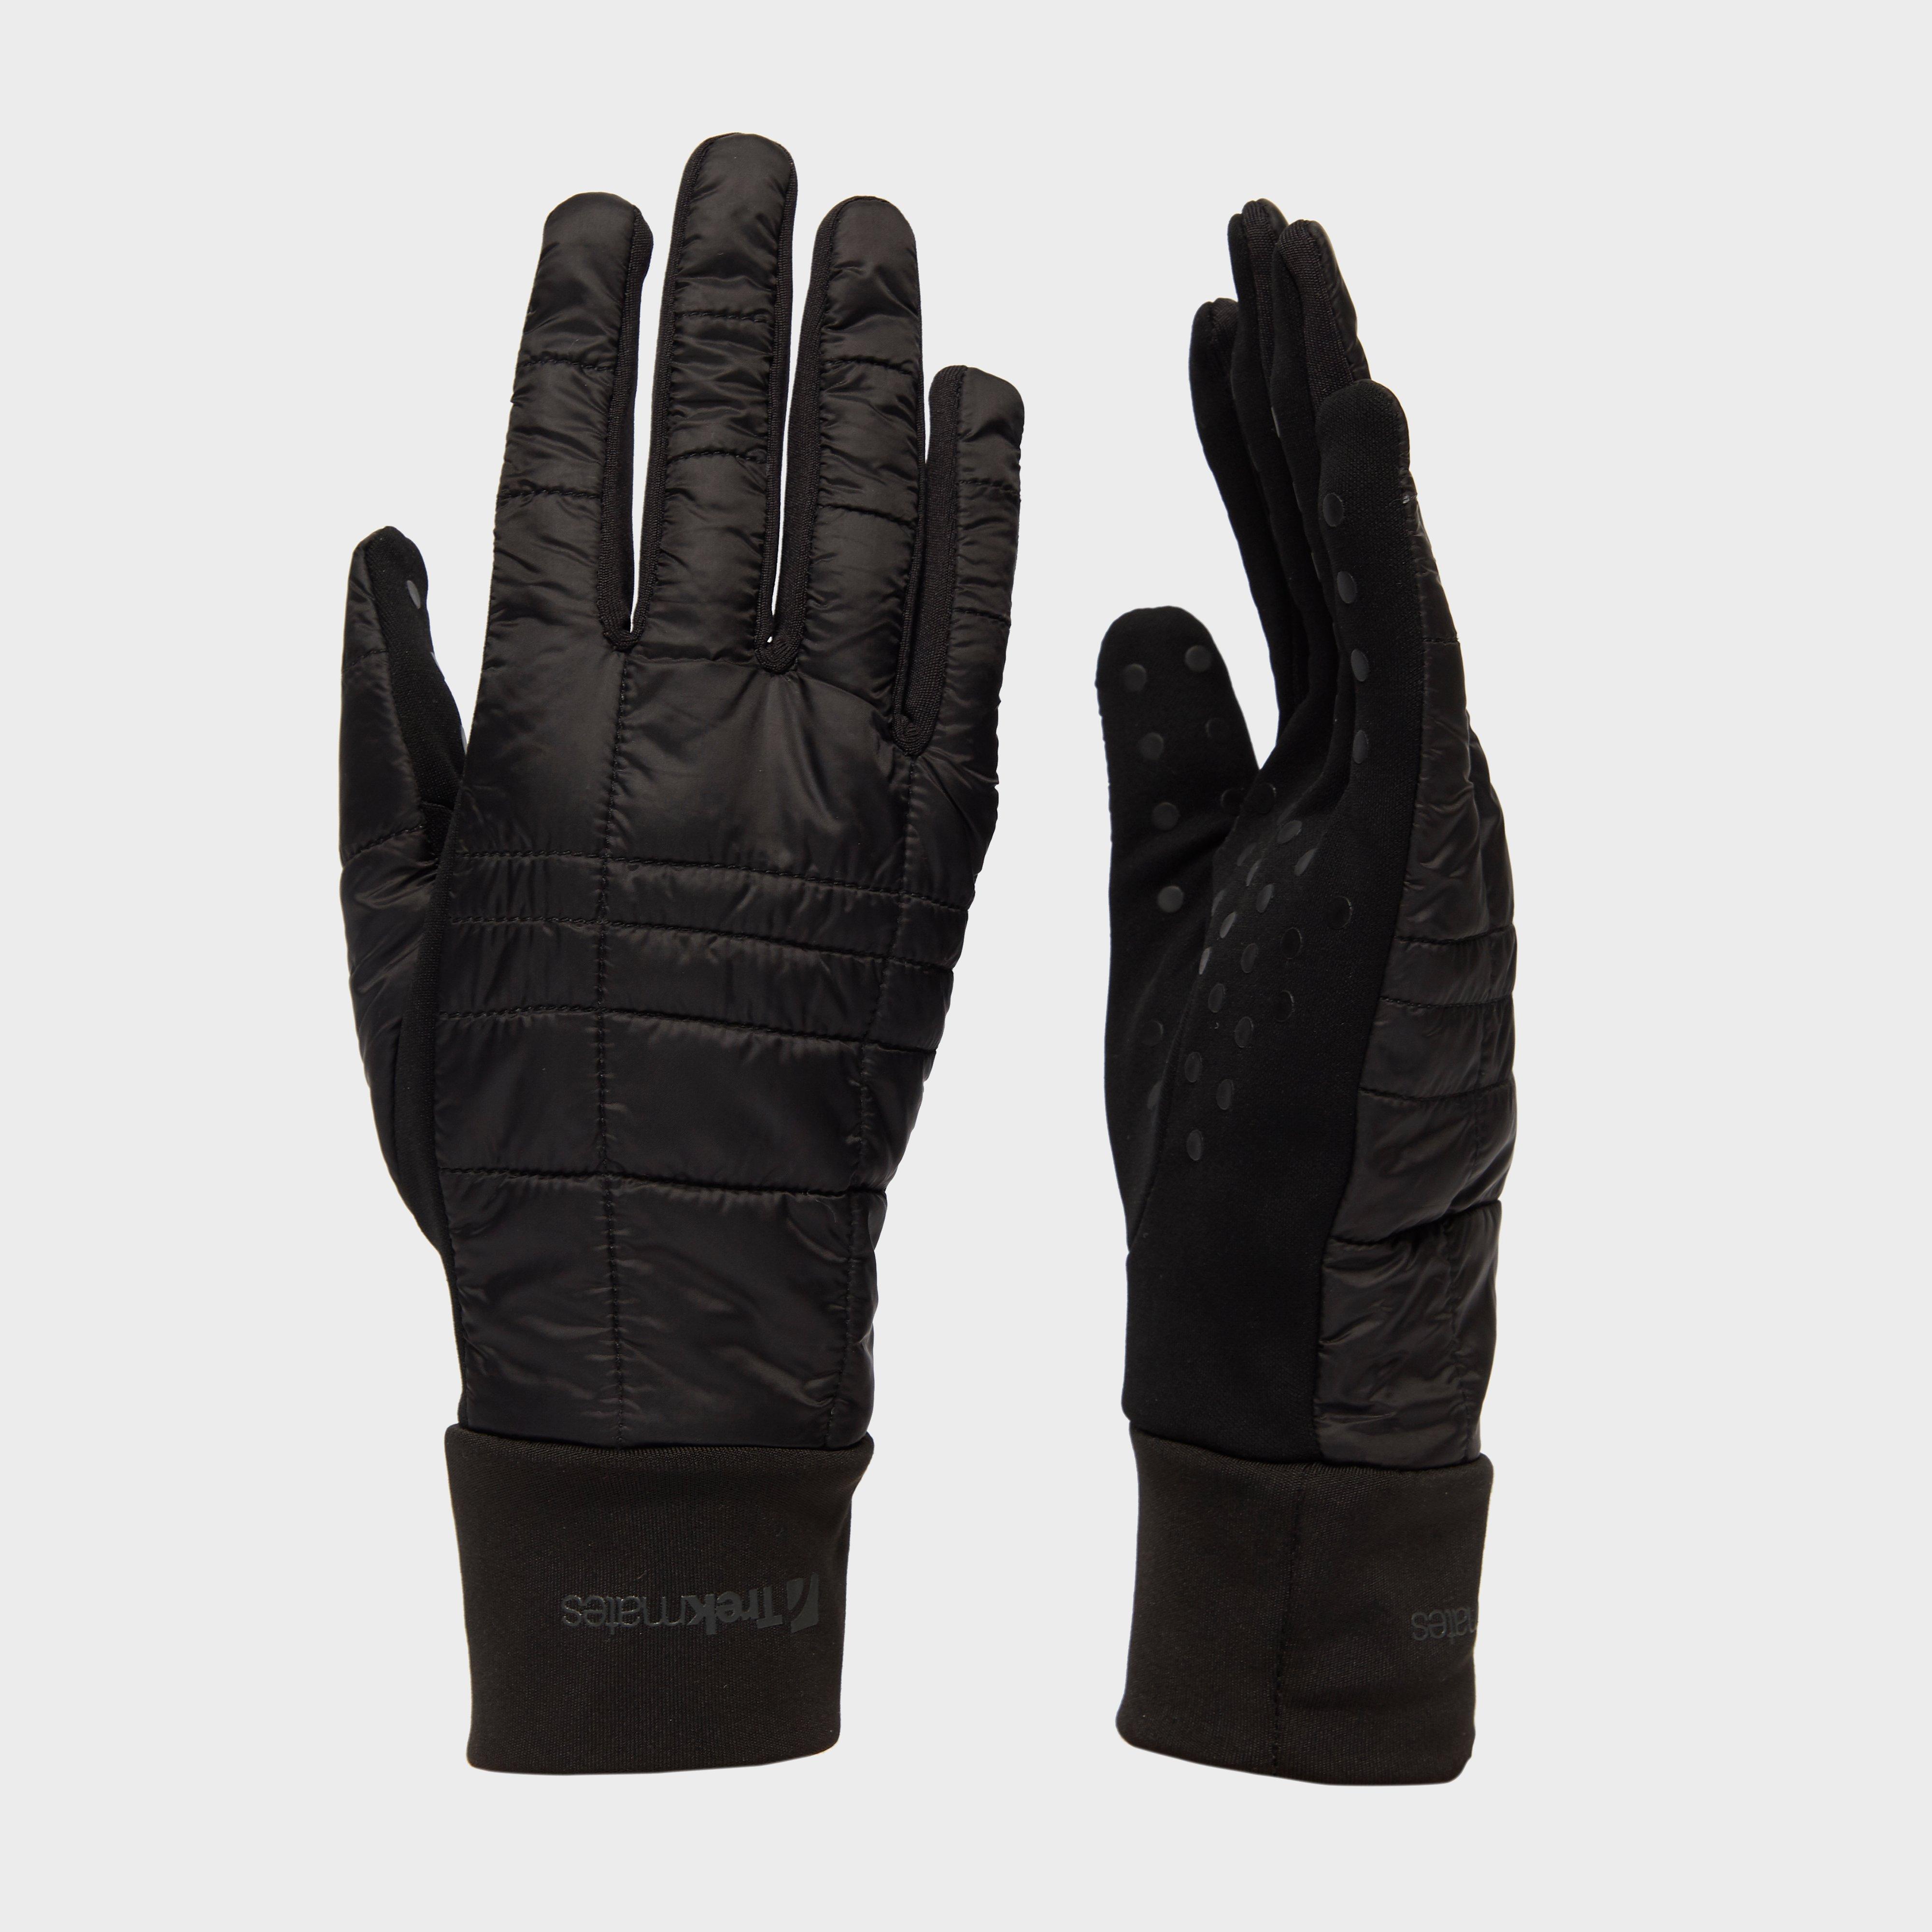 Trekmates Women's Stretch Grip Hybrid Gloves, Black